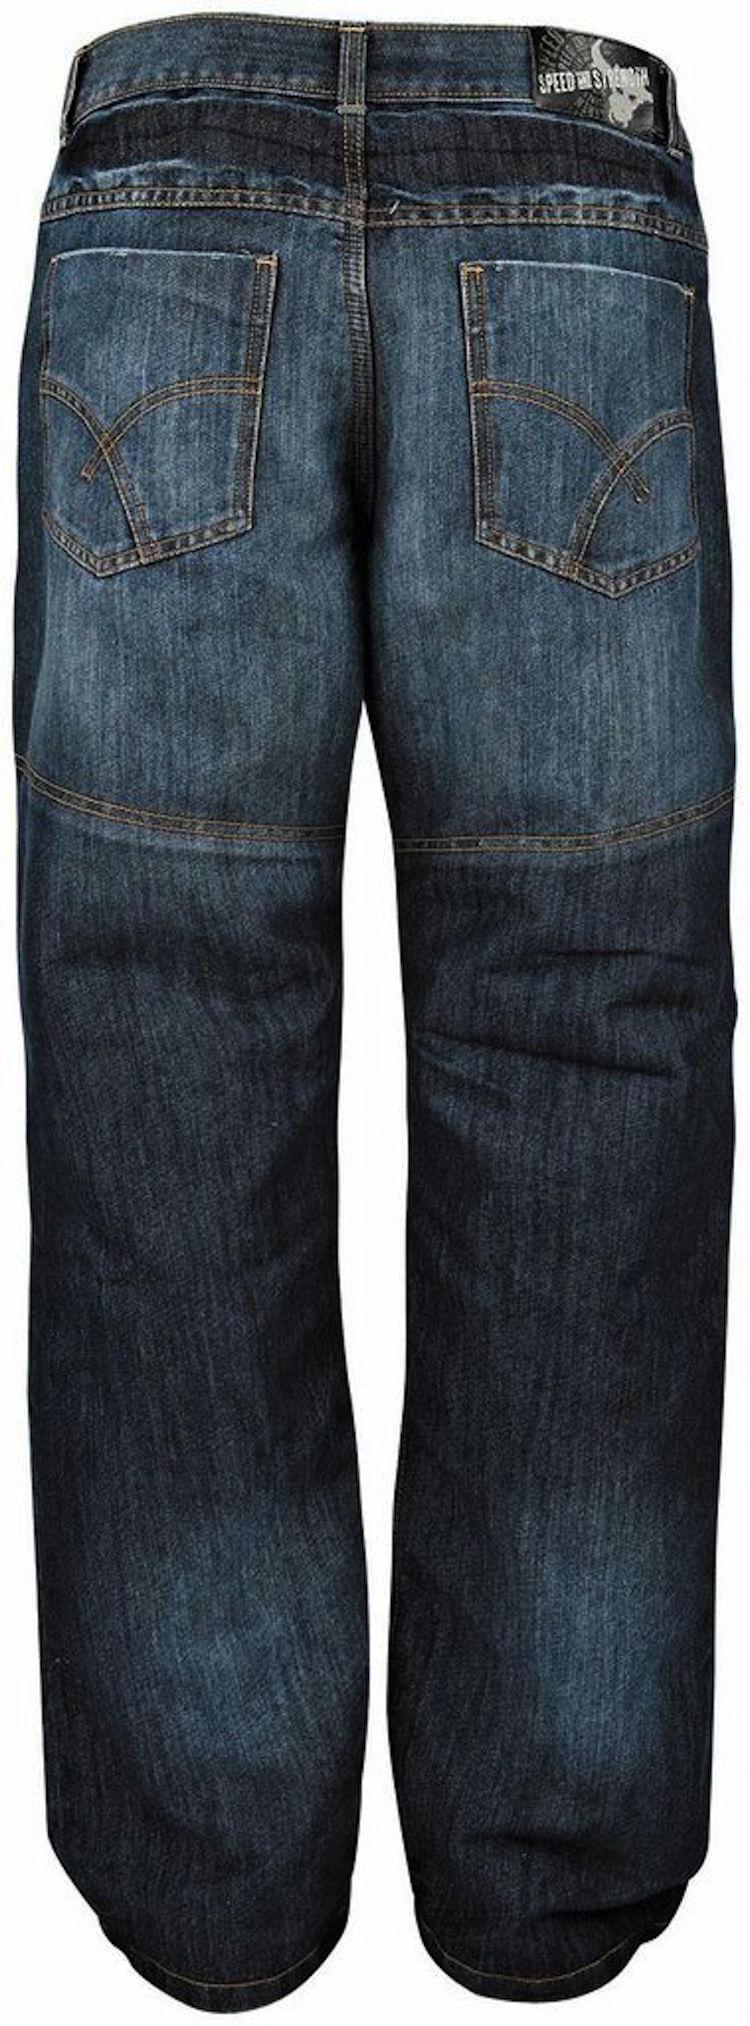 Speed_Strength_Jeans